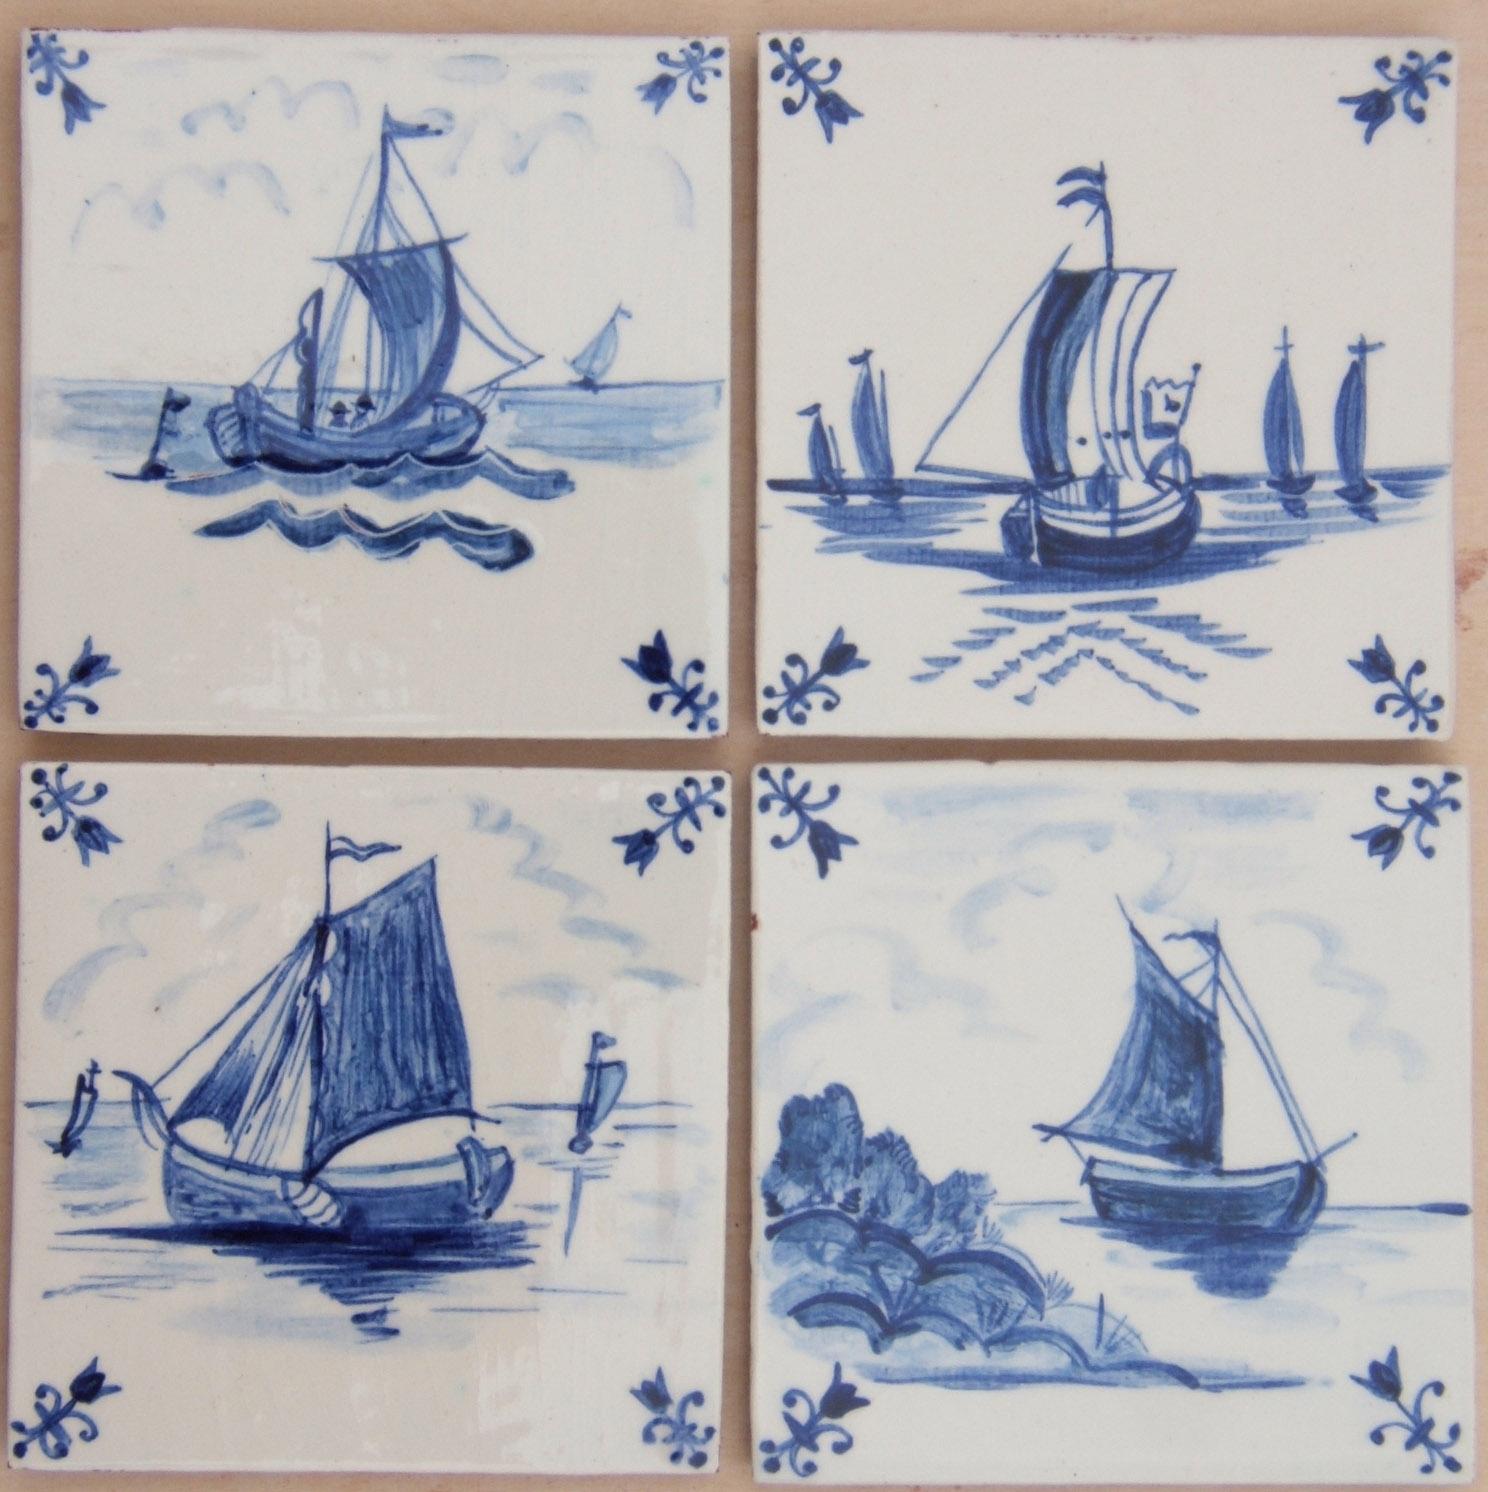 Delft-tulip-corners-and-boats.jpg